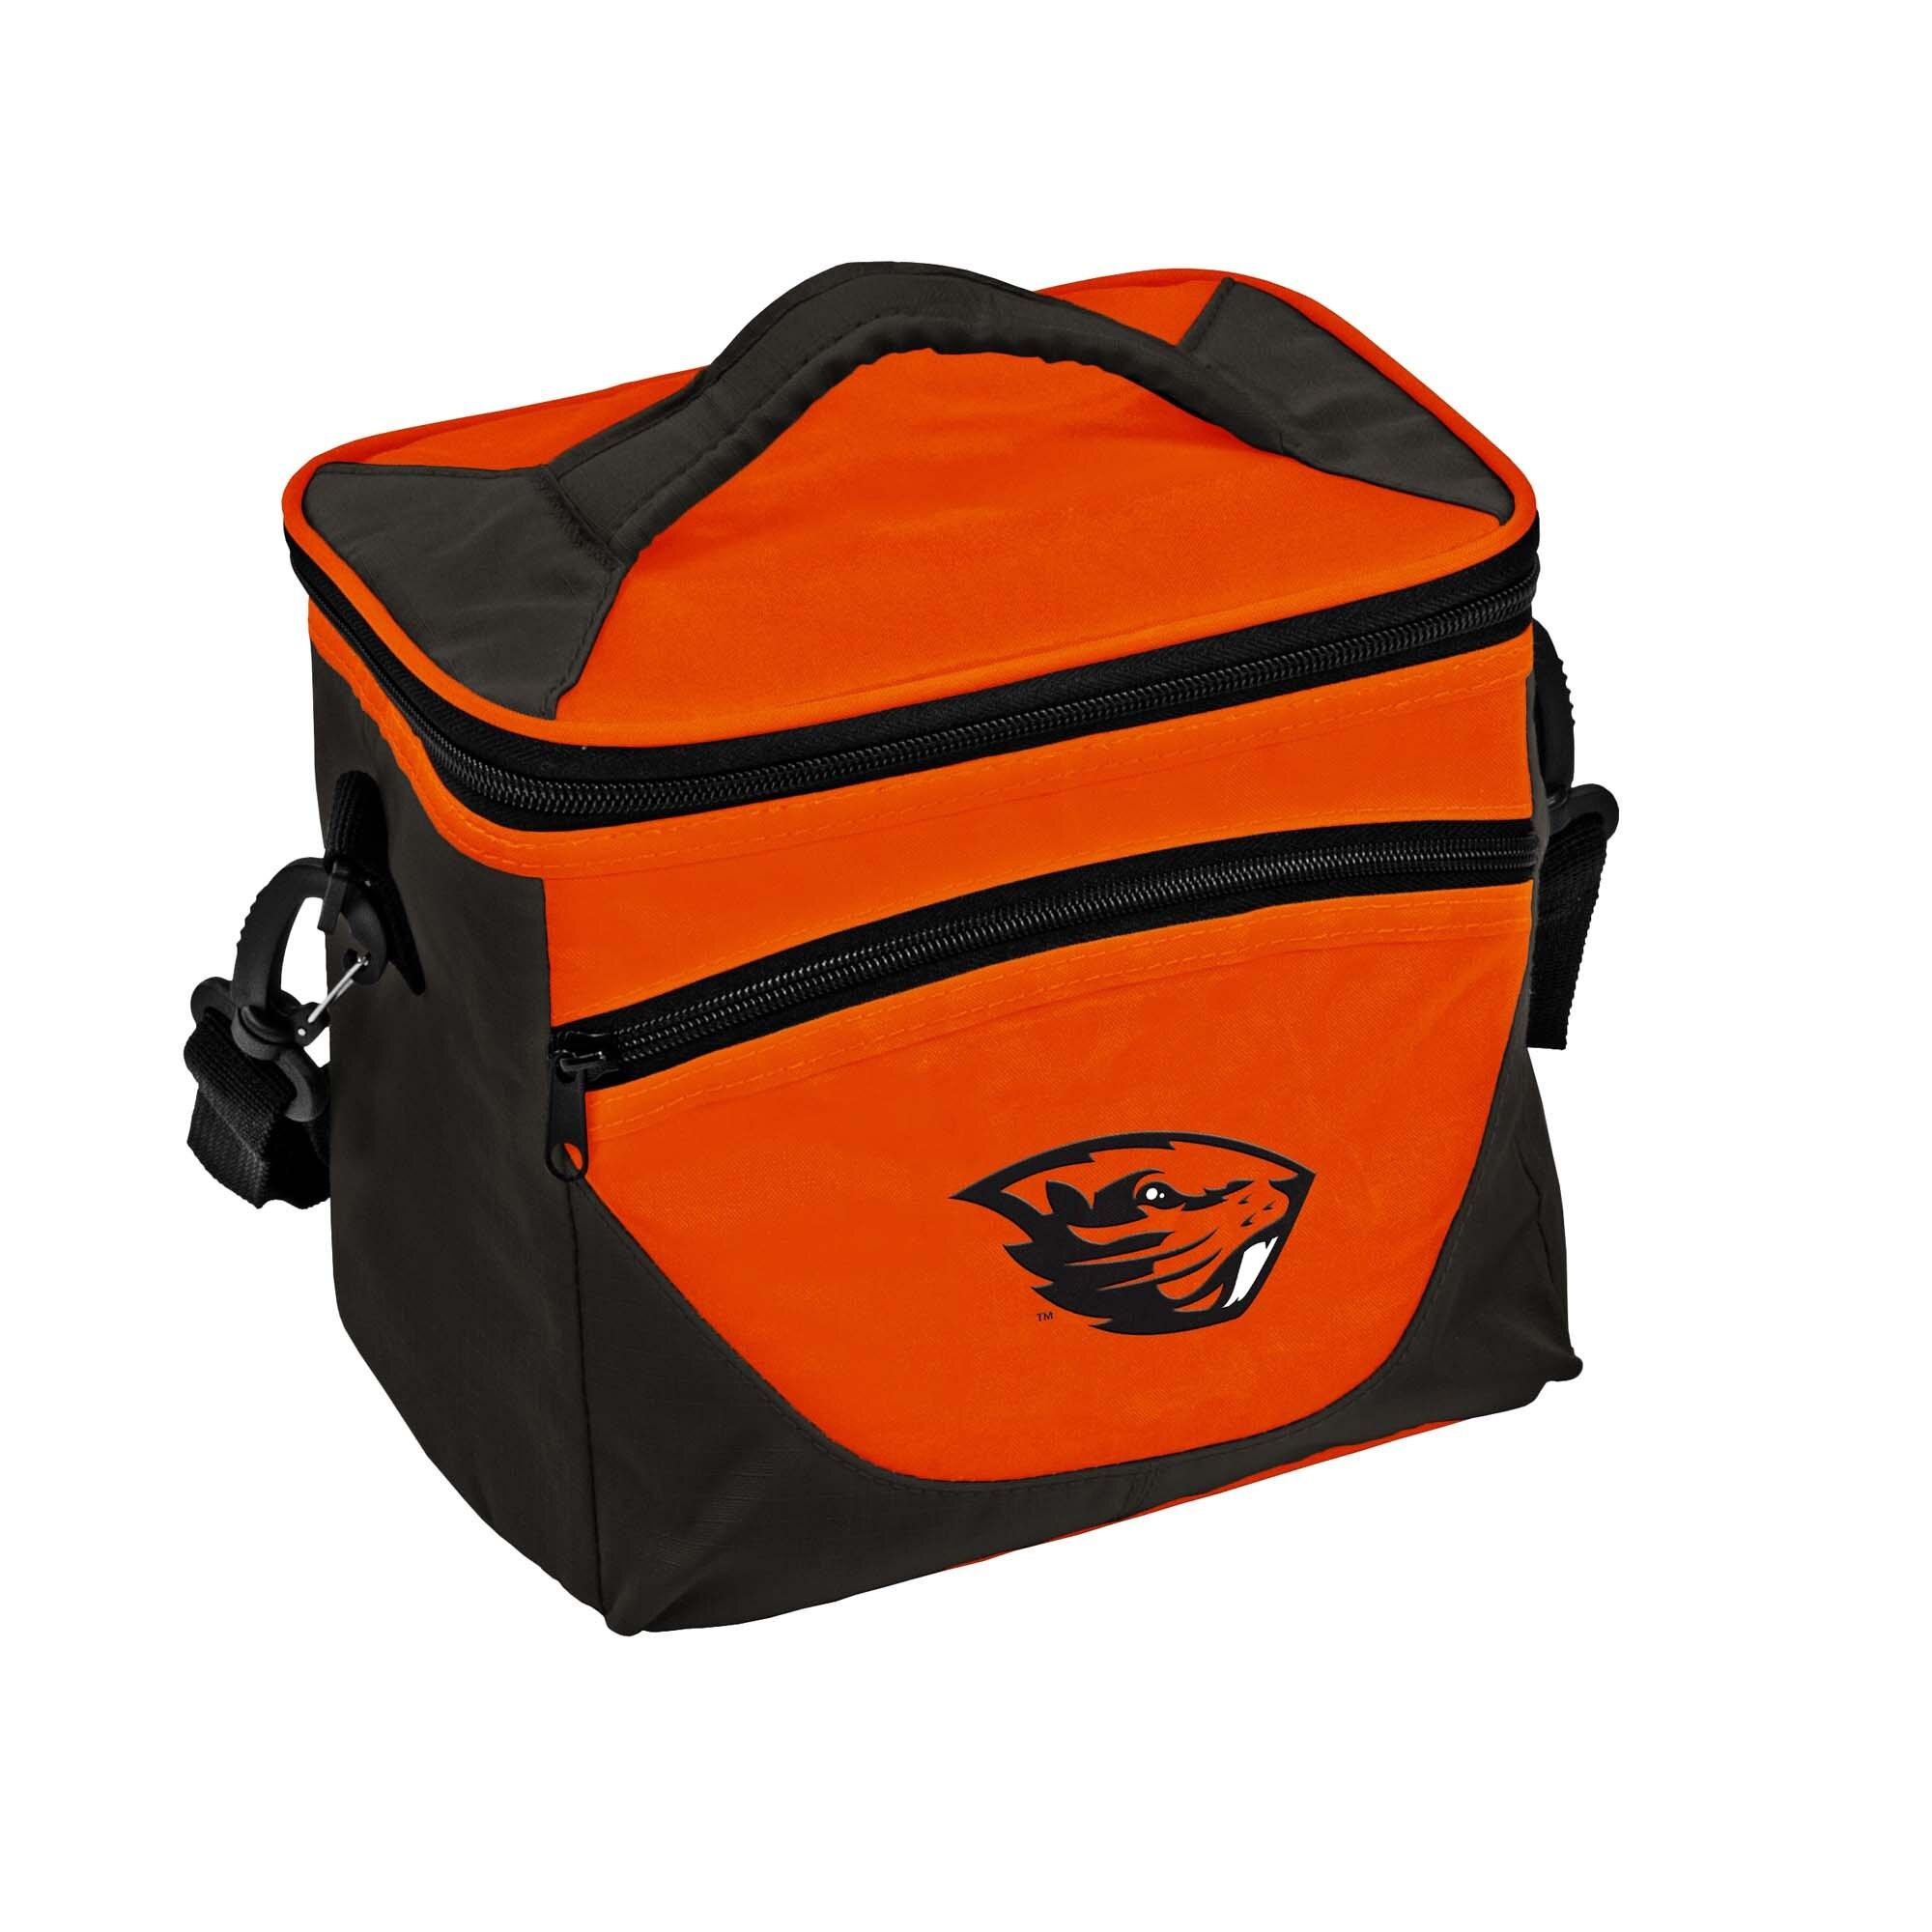 Oregon State Beavers Halftime Lunch Cooler